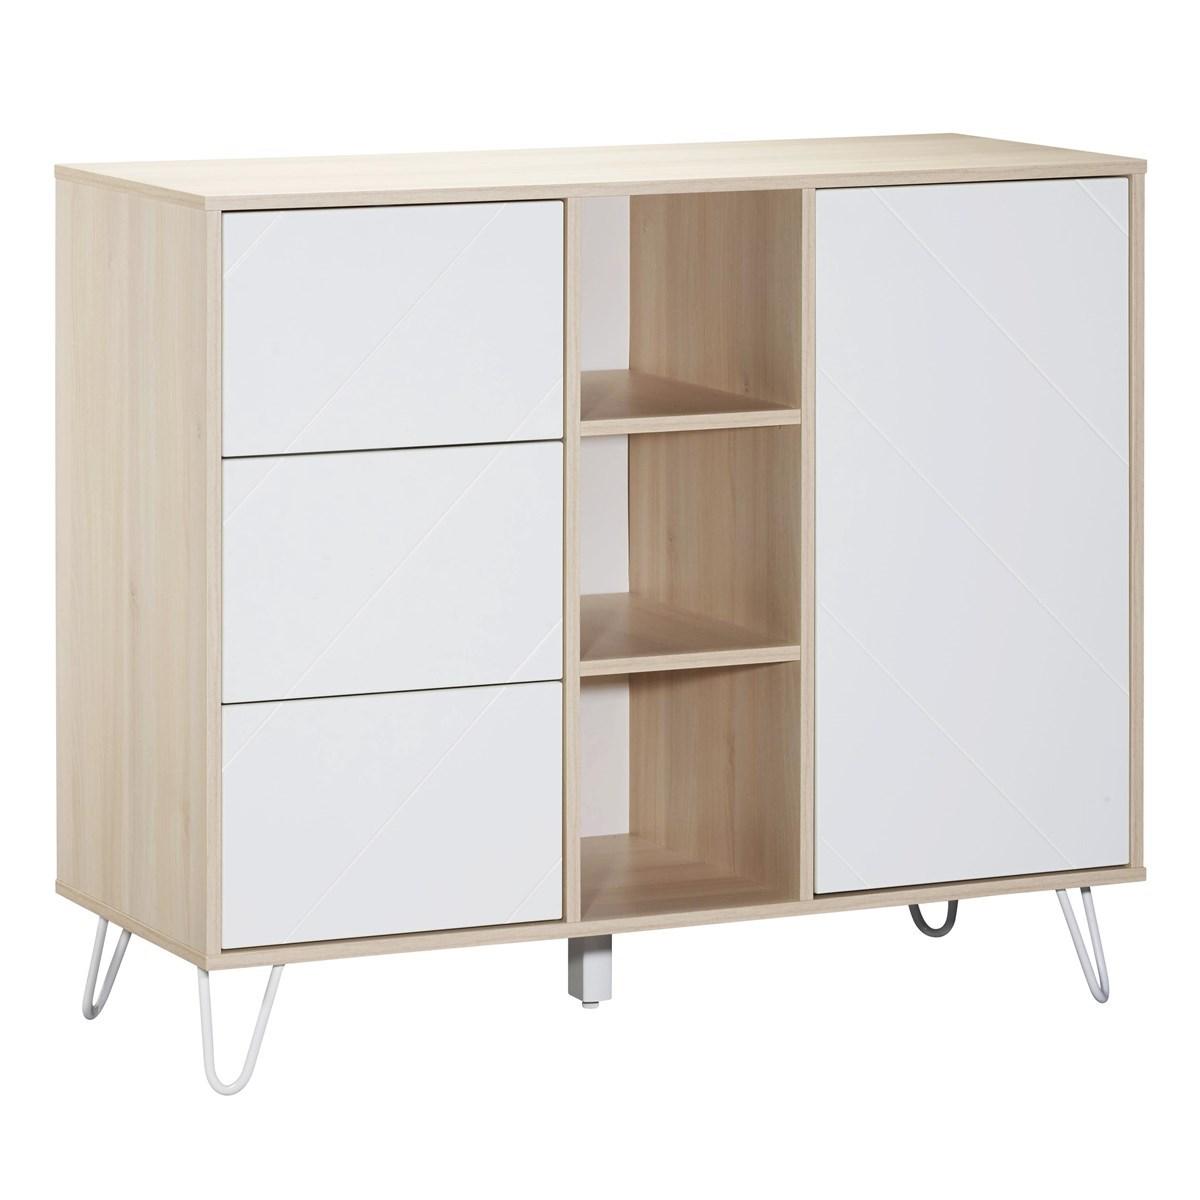 Commode 1 porte 3 tiroirs et 3 niches en mdf blanc